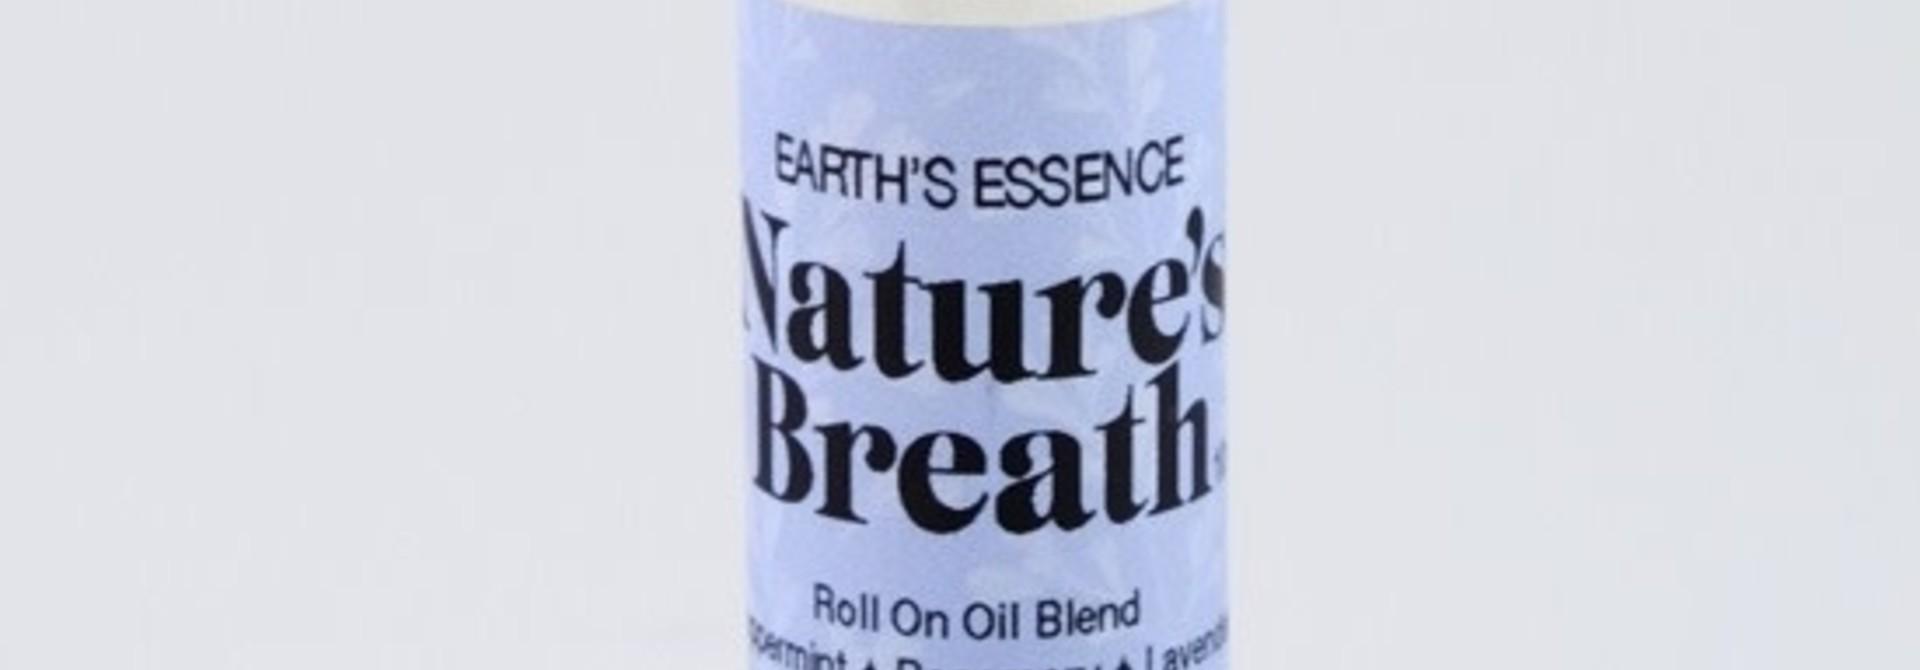 Nature's Breath (Peppermint/Rosemary/Lavendar)